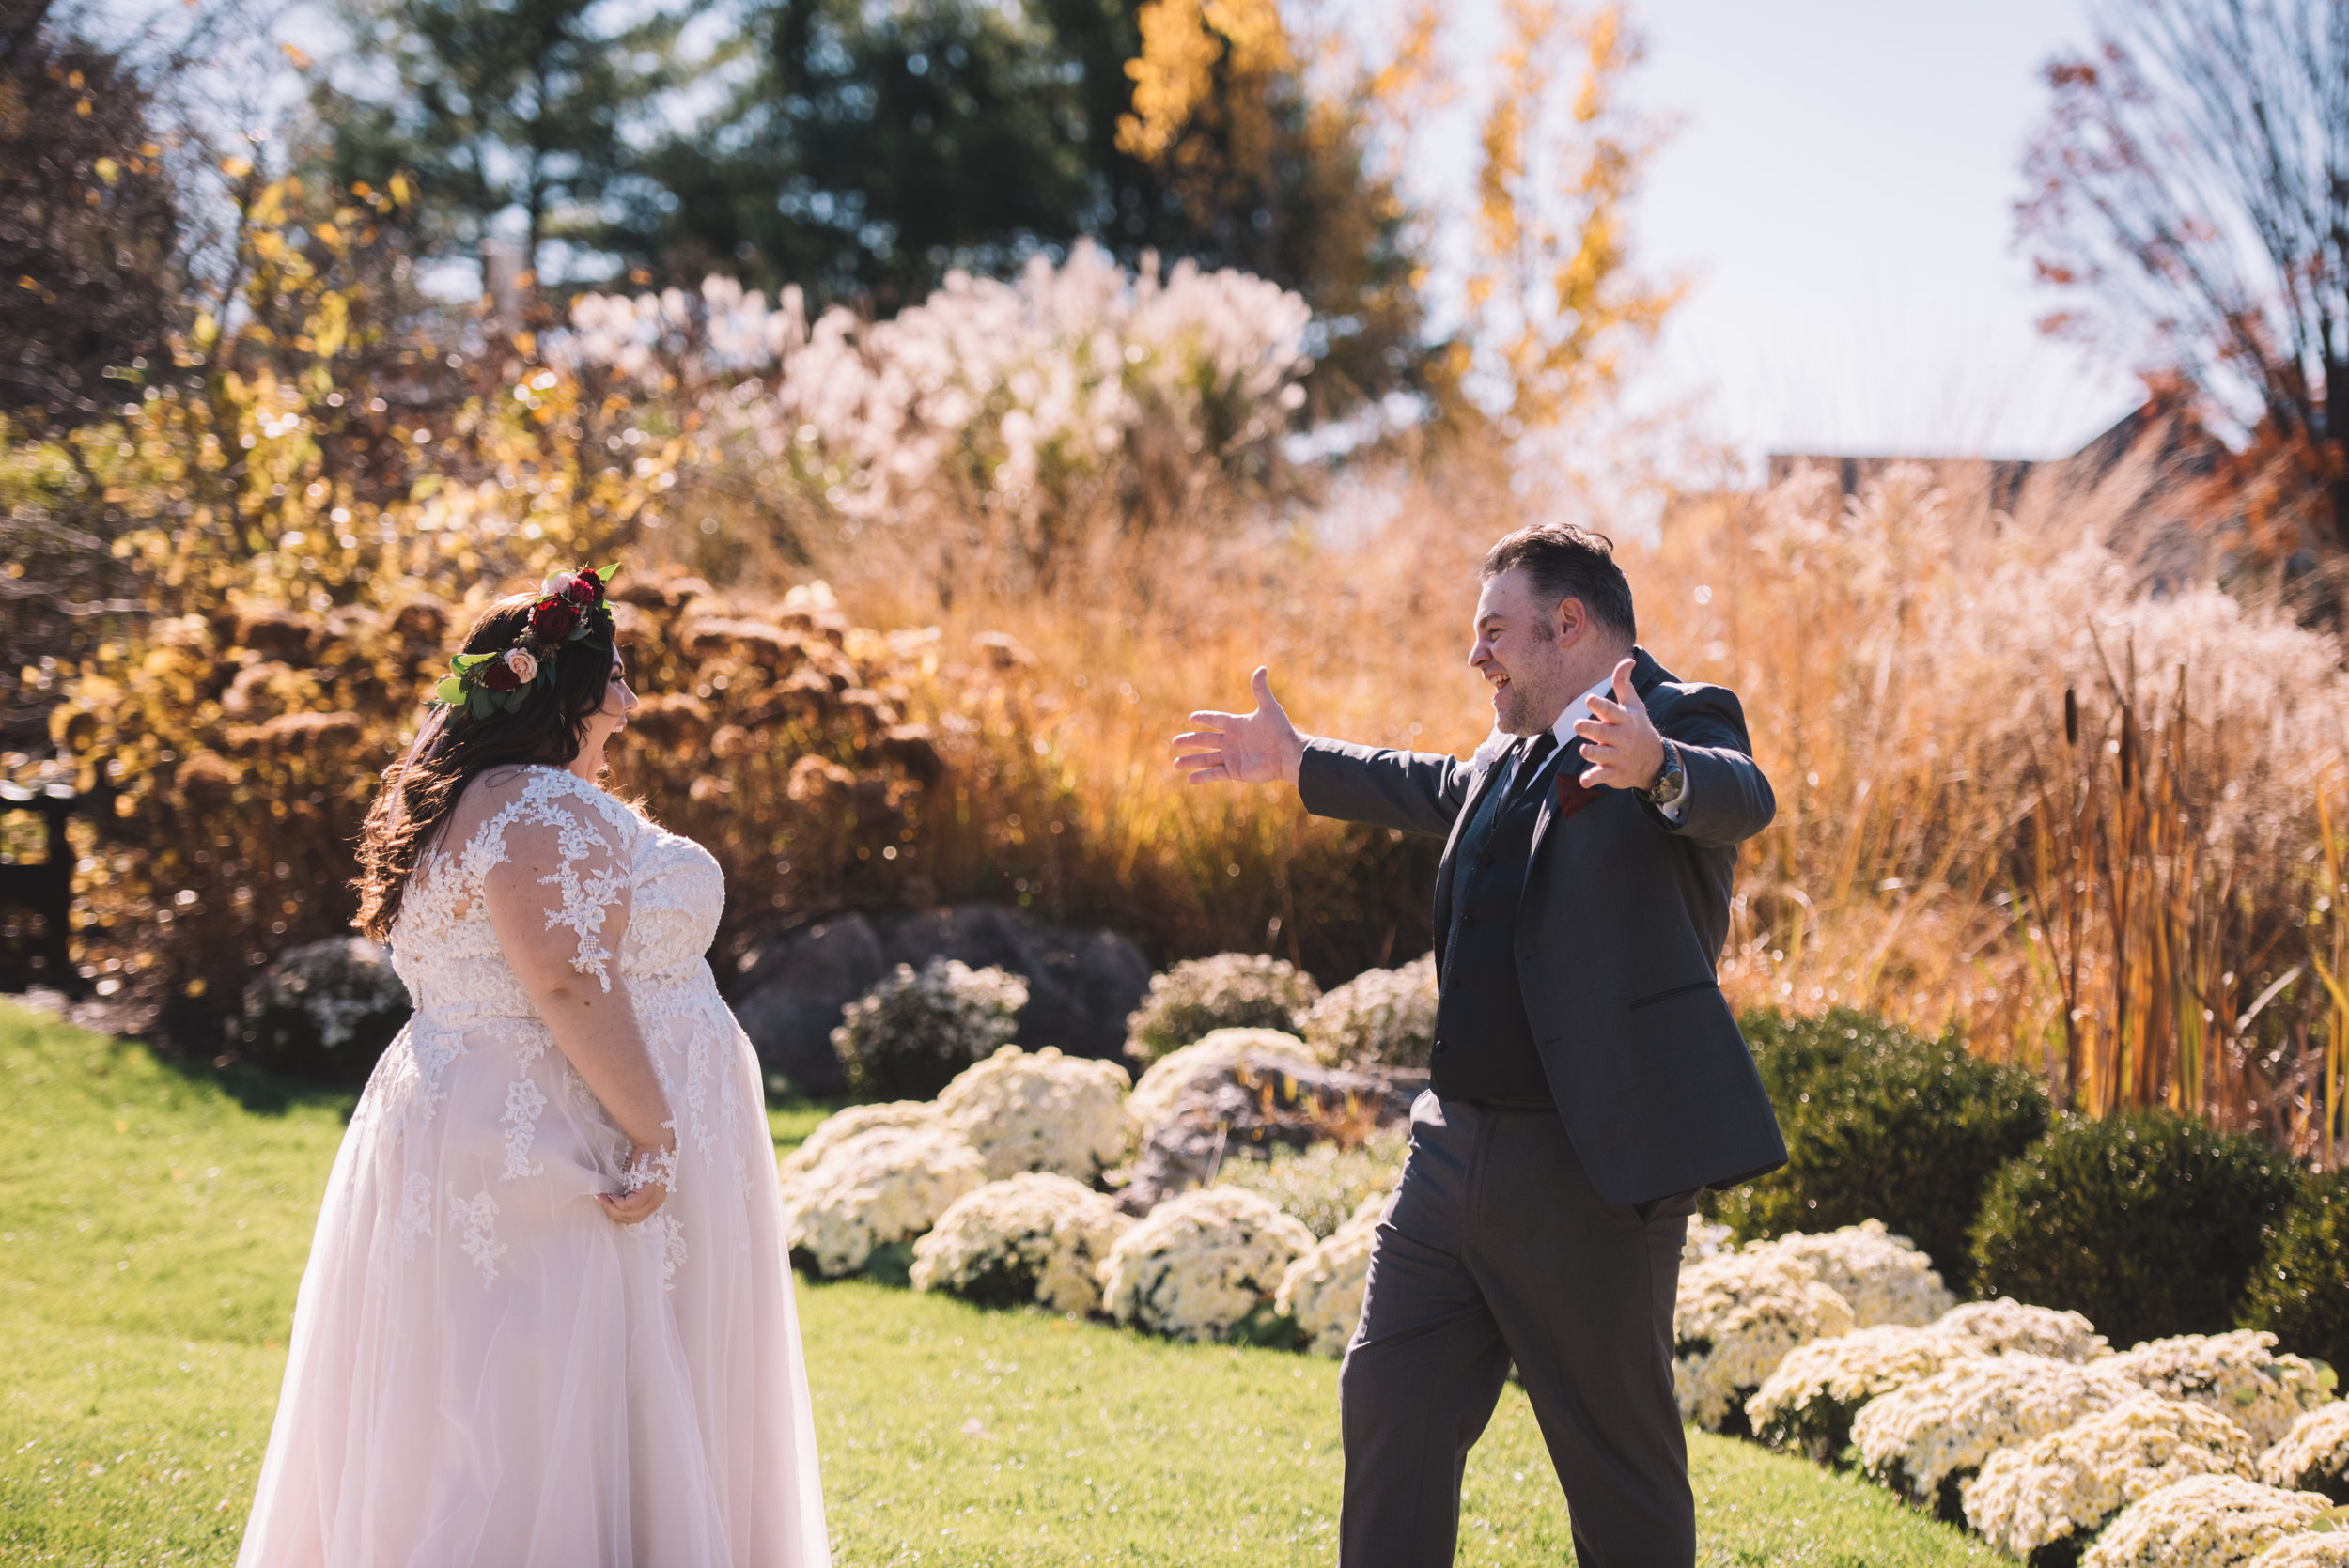 WeddingPhotos | NJPhotographer | Highlights-5-37.jpg